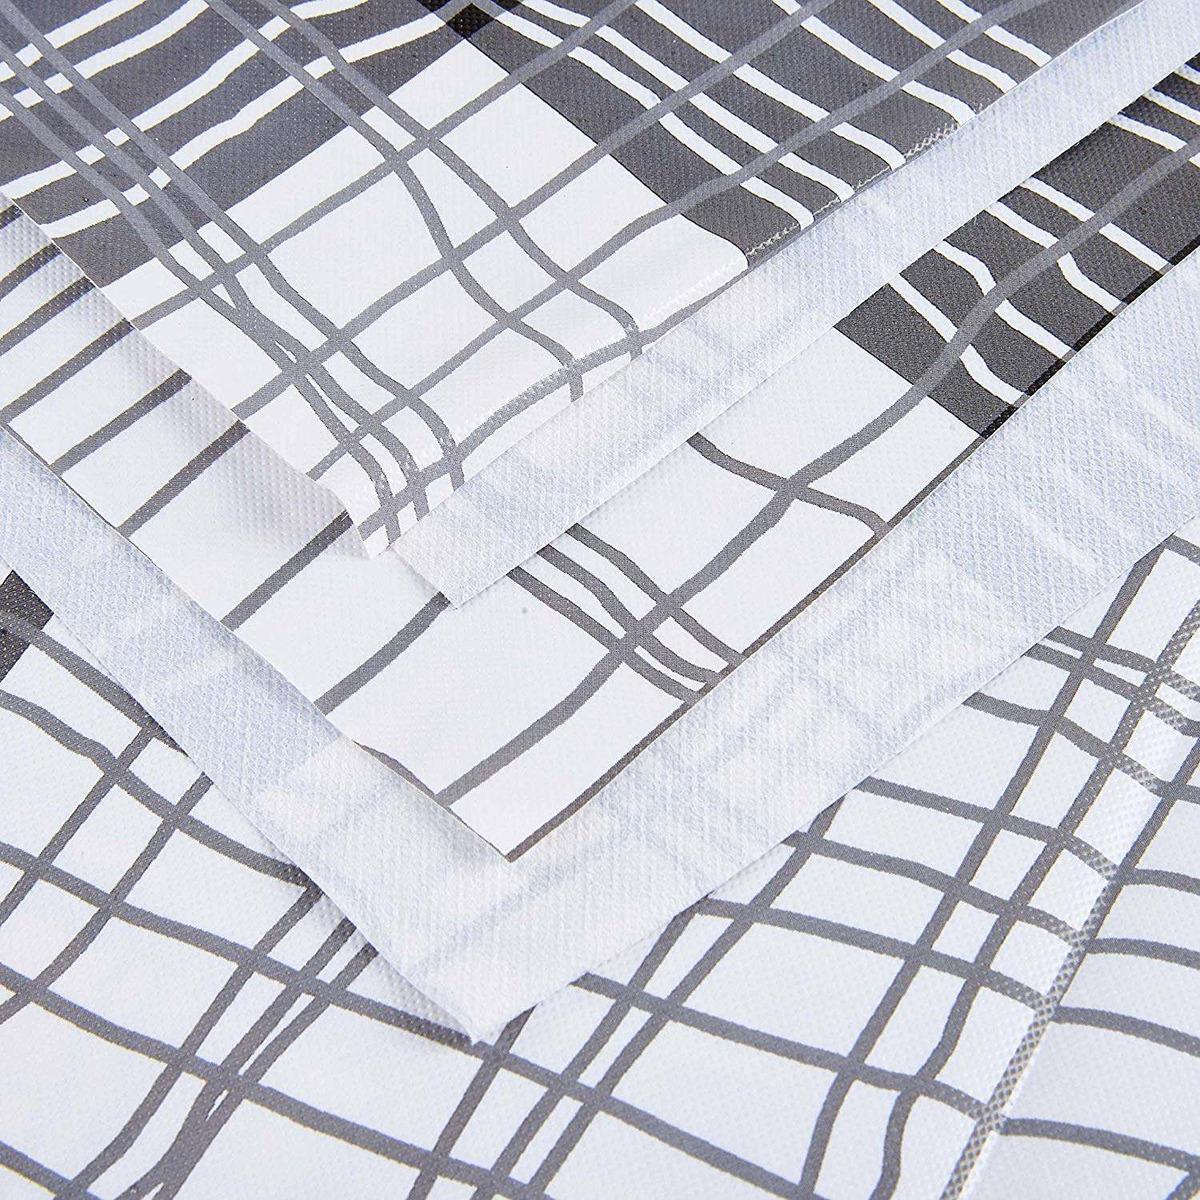 Alicemall Modern Rectangular Table Cloth White Gray Black Stripes Plastic PVC x